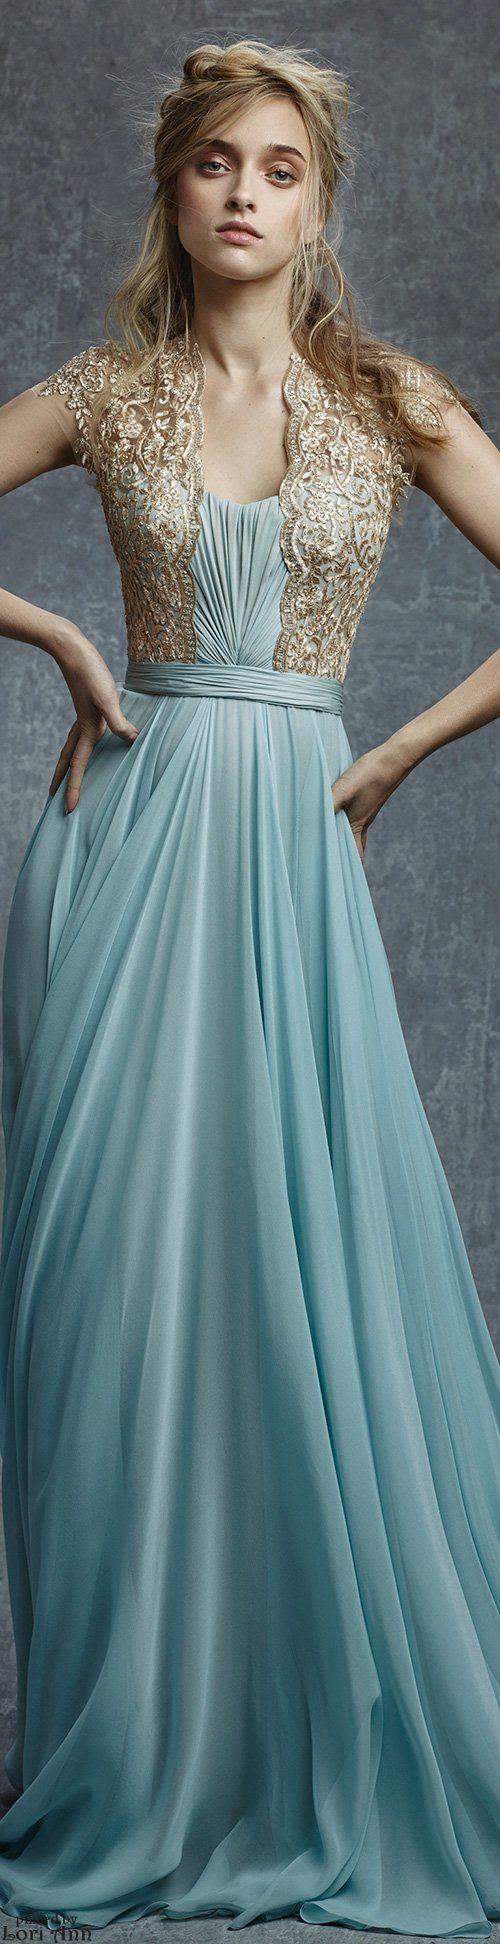 574 best Vestidos Festa images on Pinterest | Party wear dresses ...